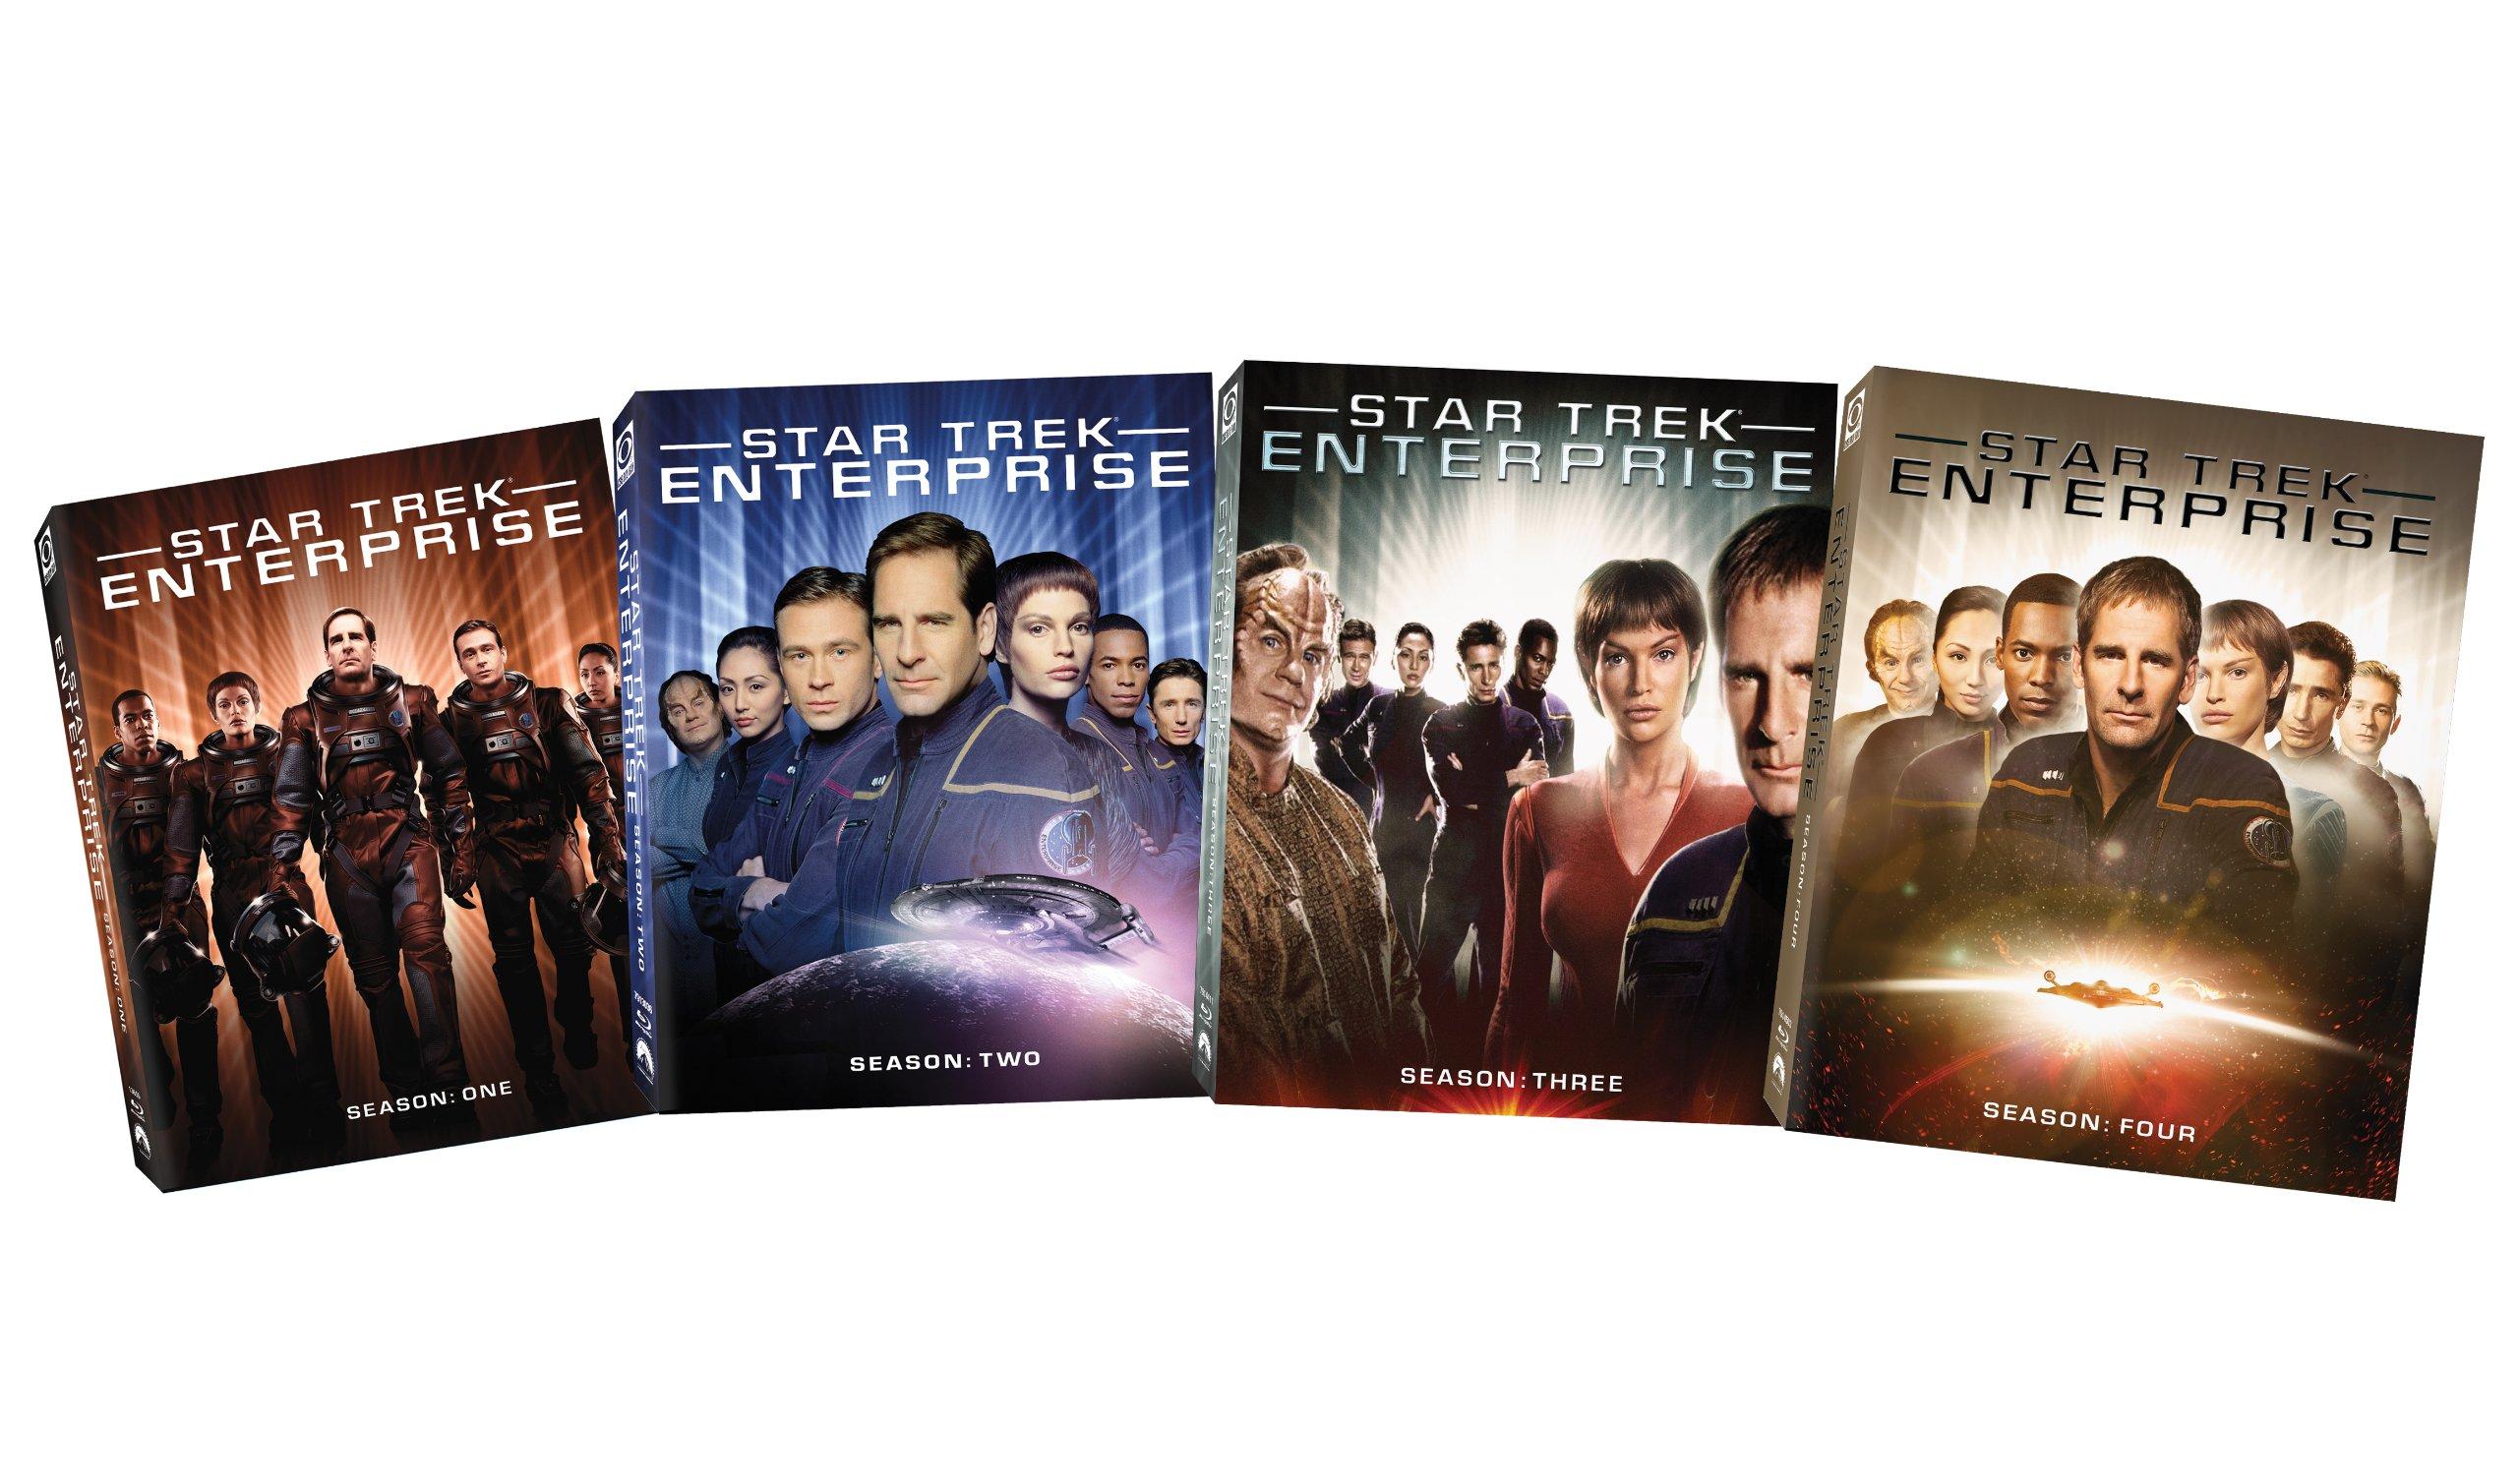 Star Trek:  Enterprise:  The Complete Series [Blu-ray] by PARAMOUNT - UNI DIST CORP